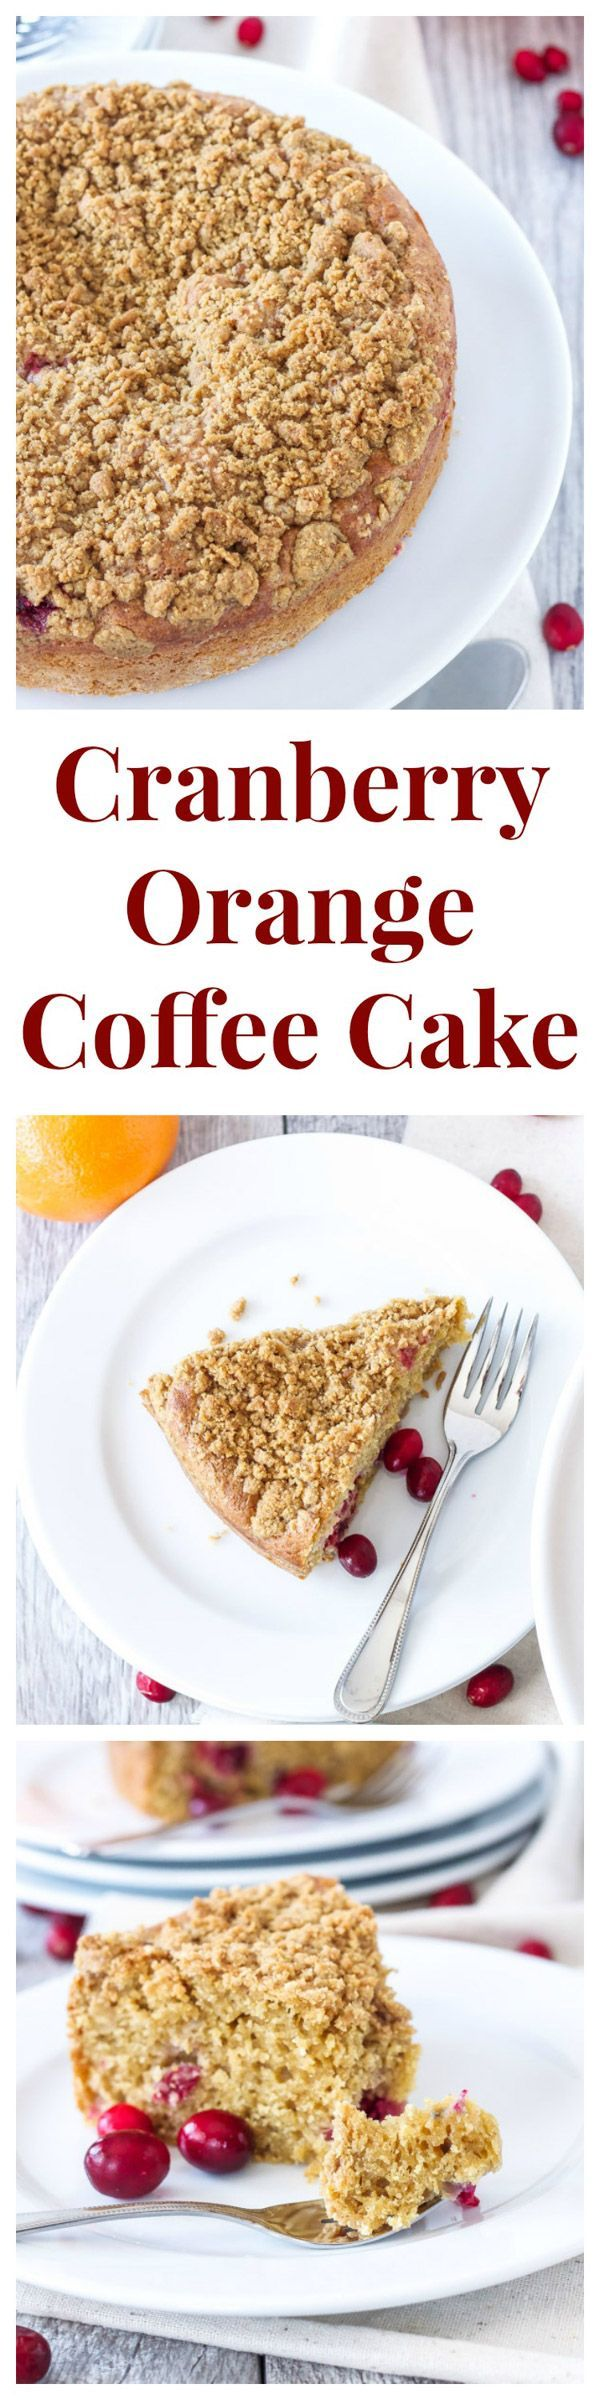 recipe: cranberry orange coffee cake recipe [37]